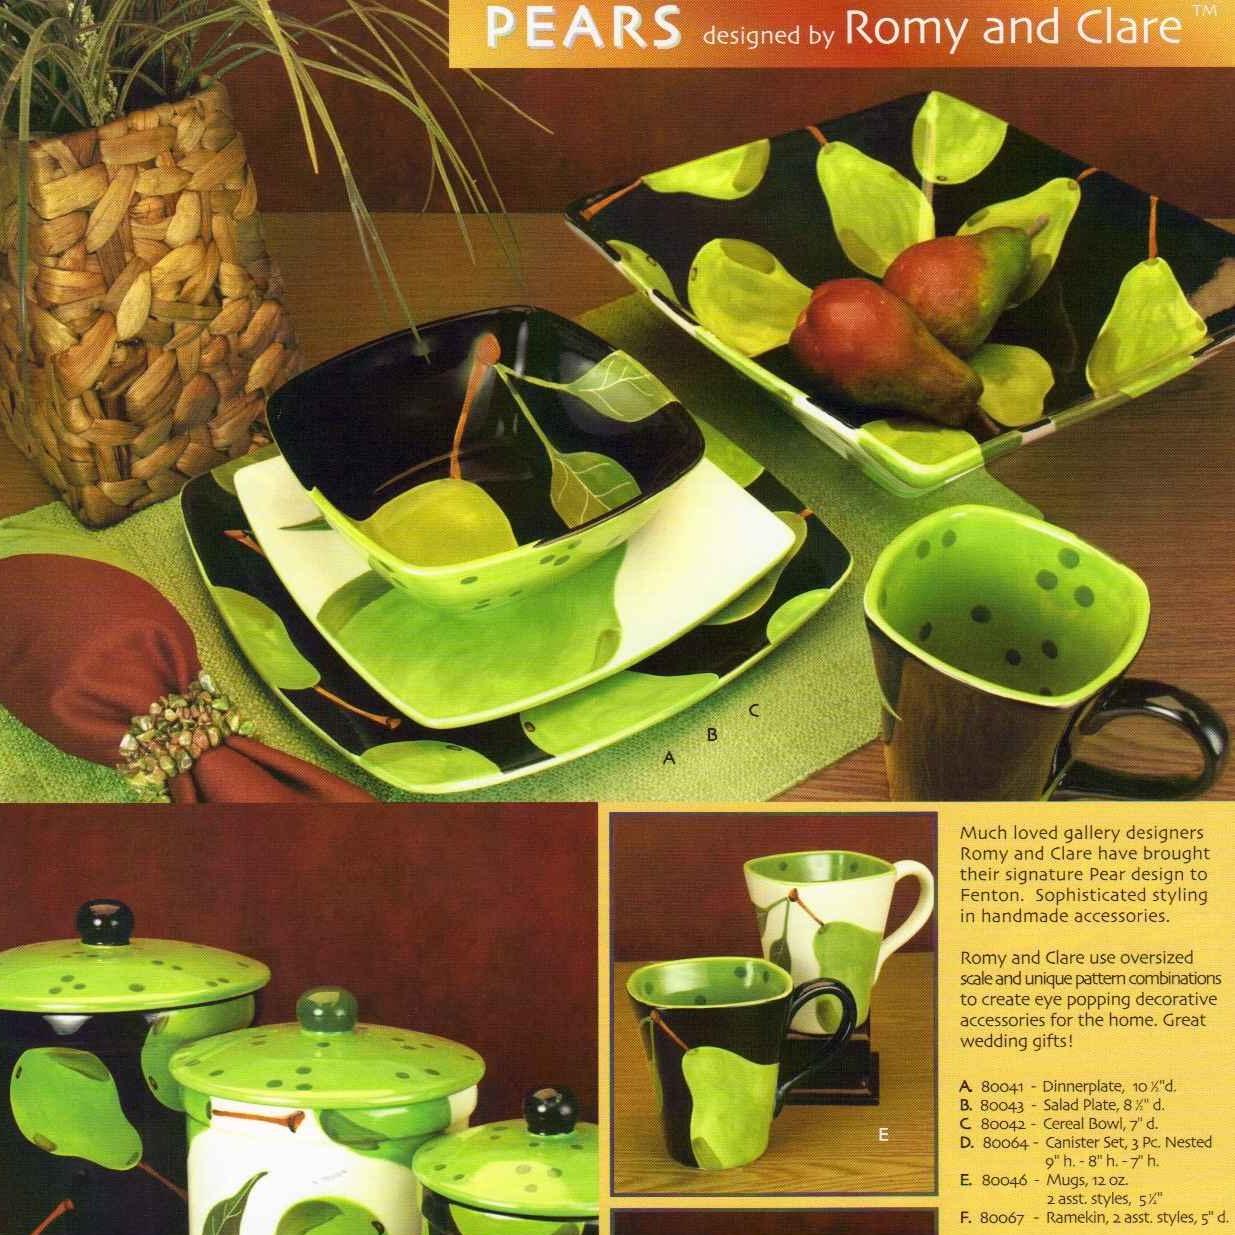 2009 Pears